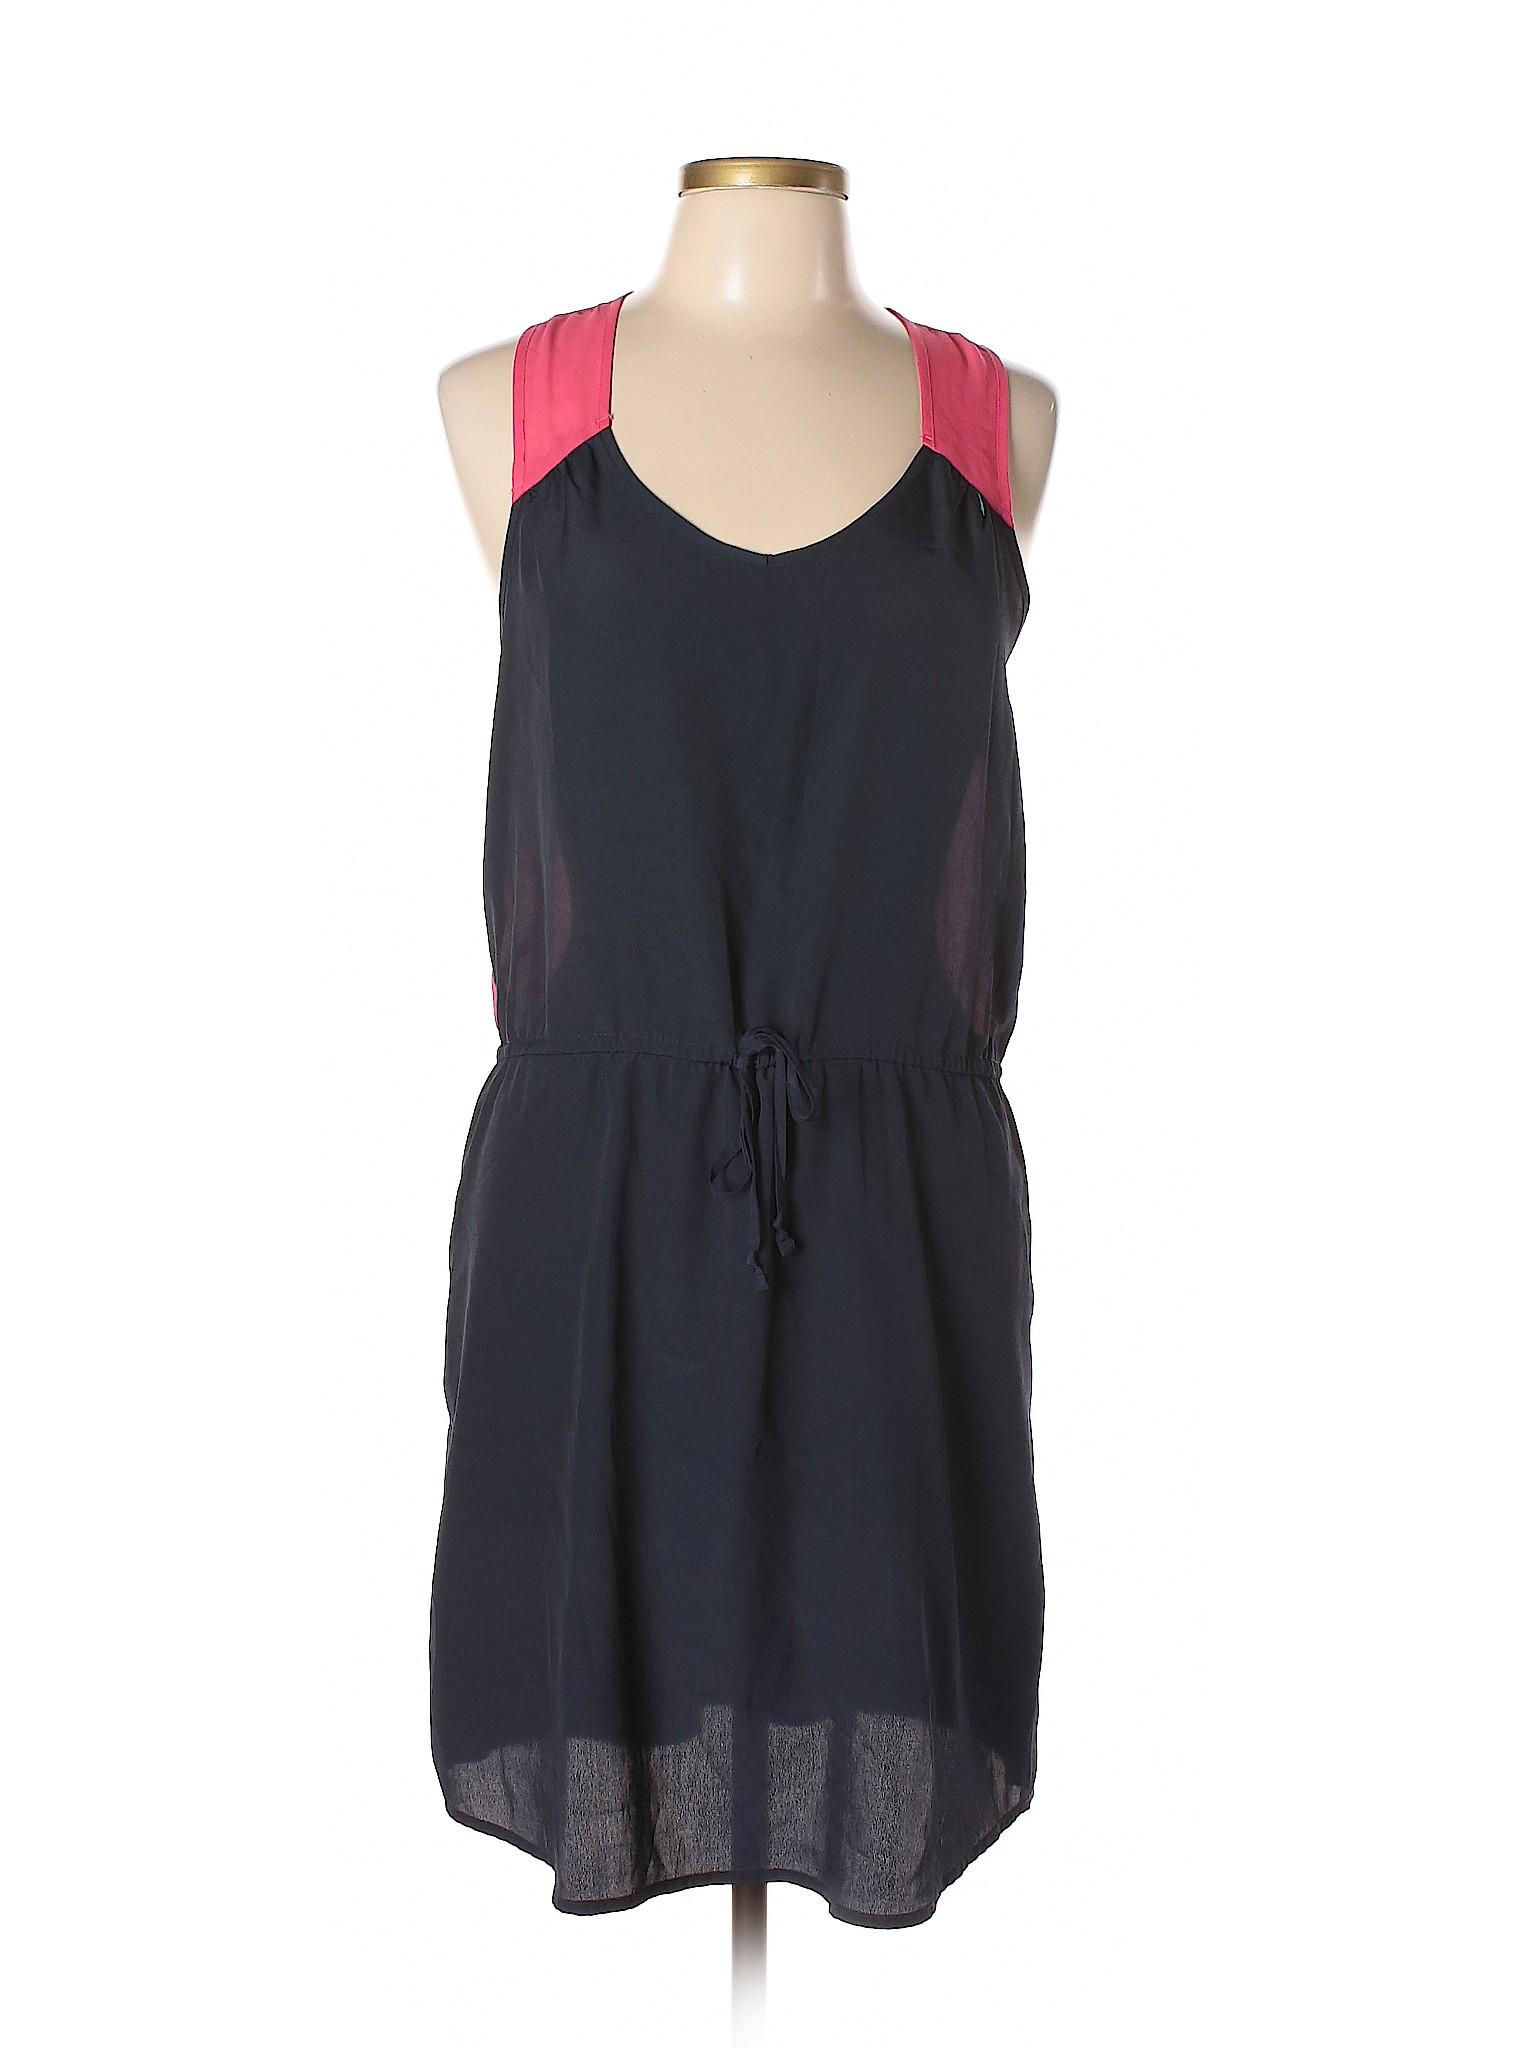 Boutique Dress Gap Outlet winter Casual zarUzq